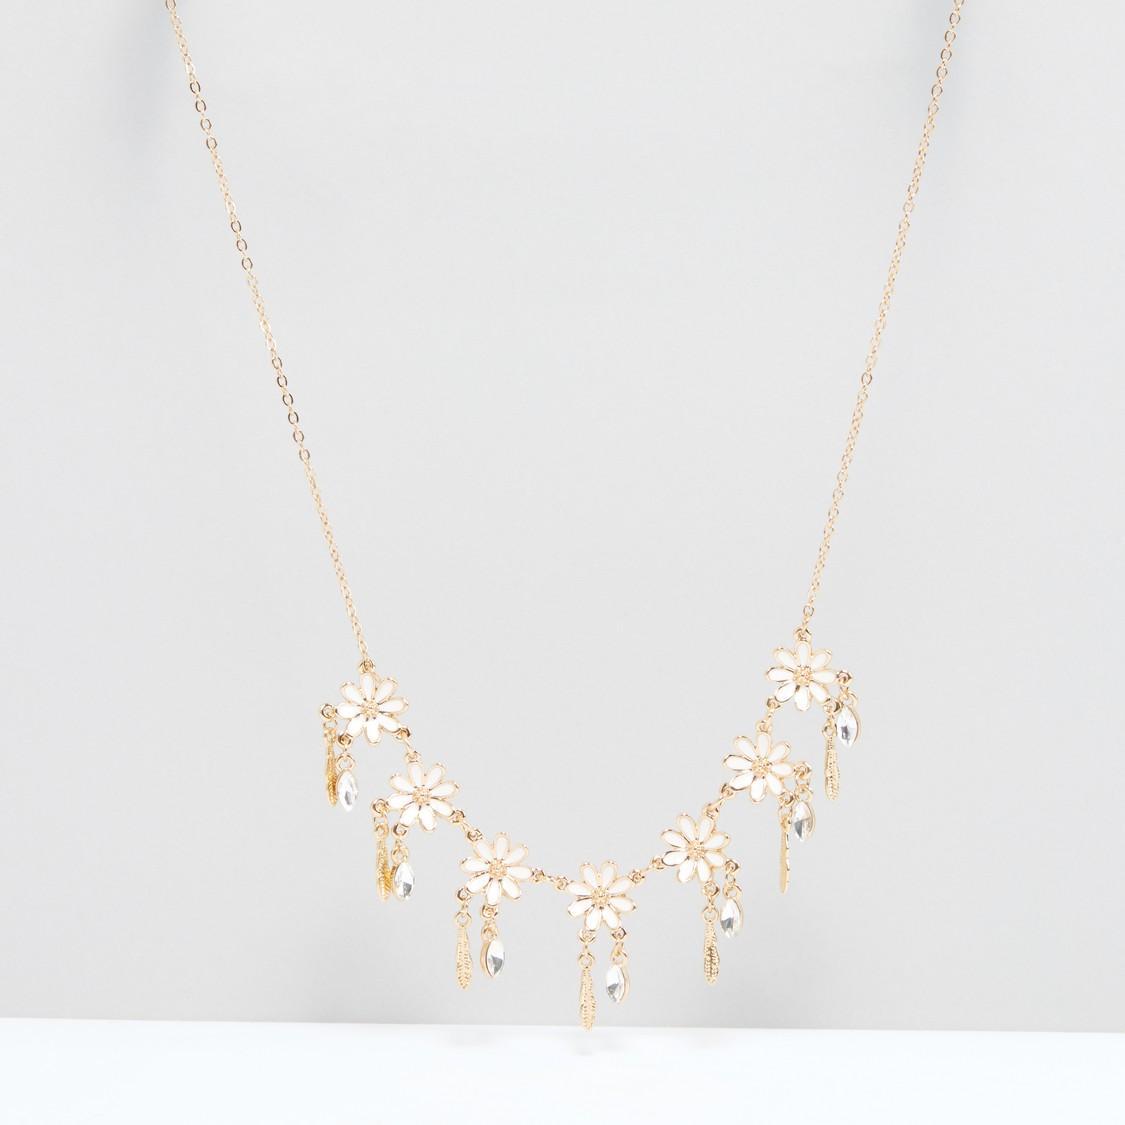 Floral Studded Necklace